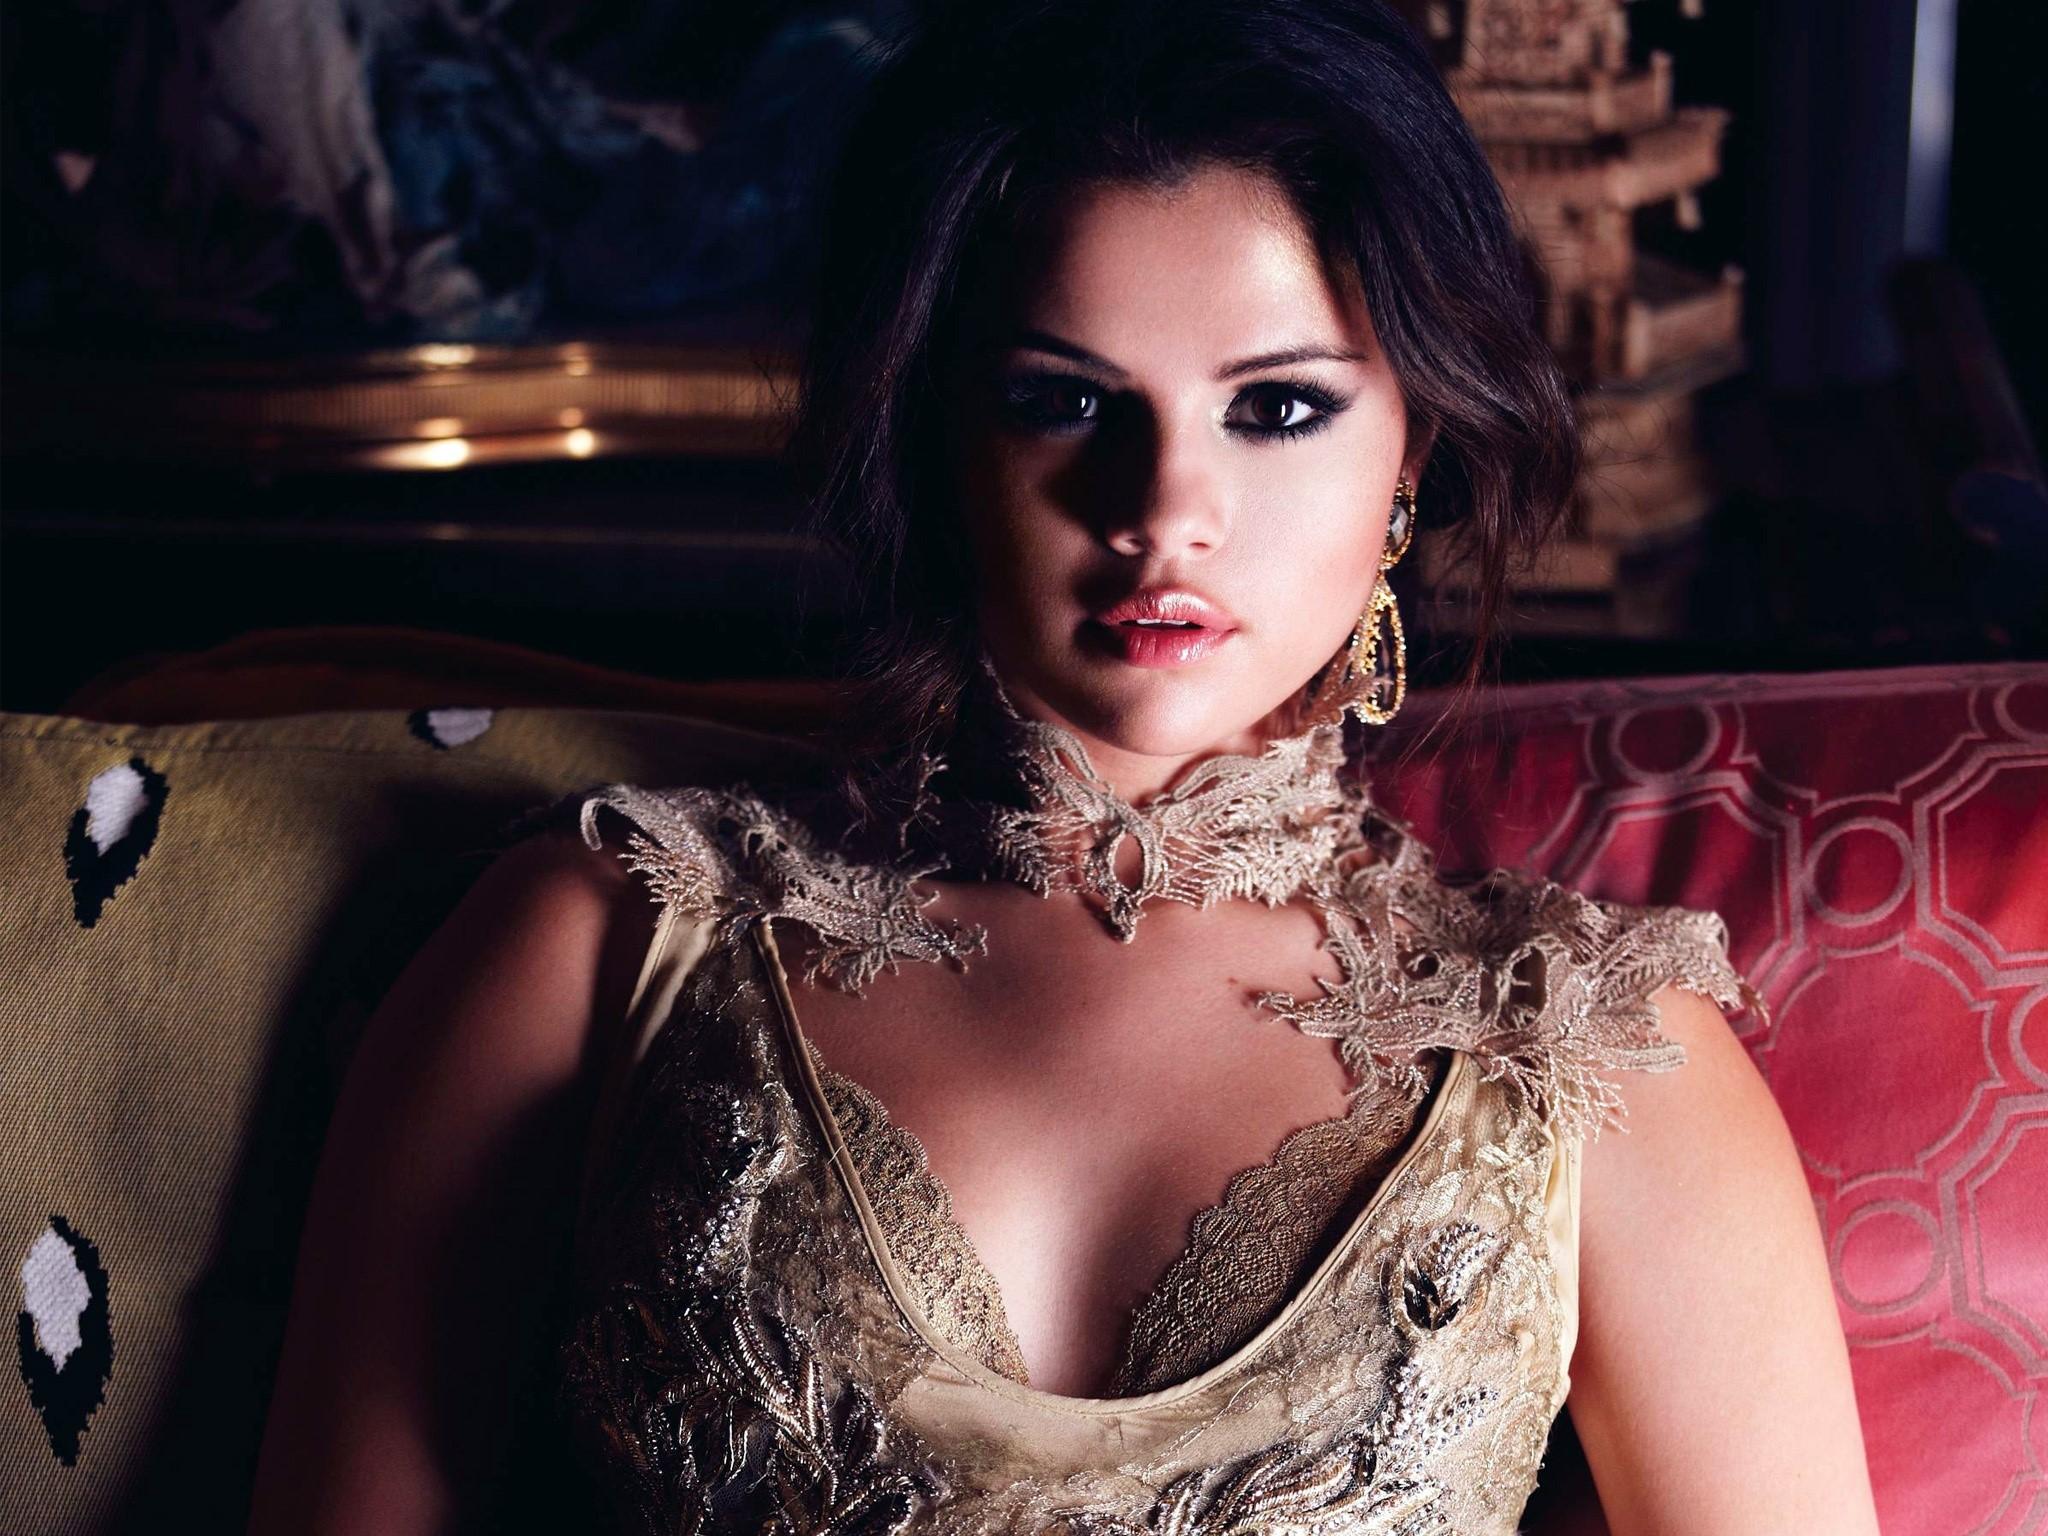 Fondos de pantalla Selena Gomez 1